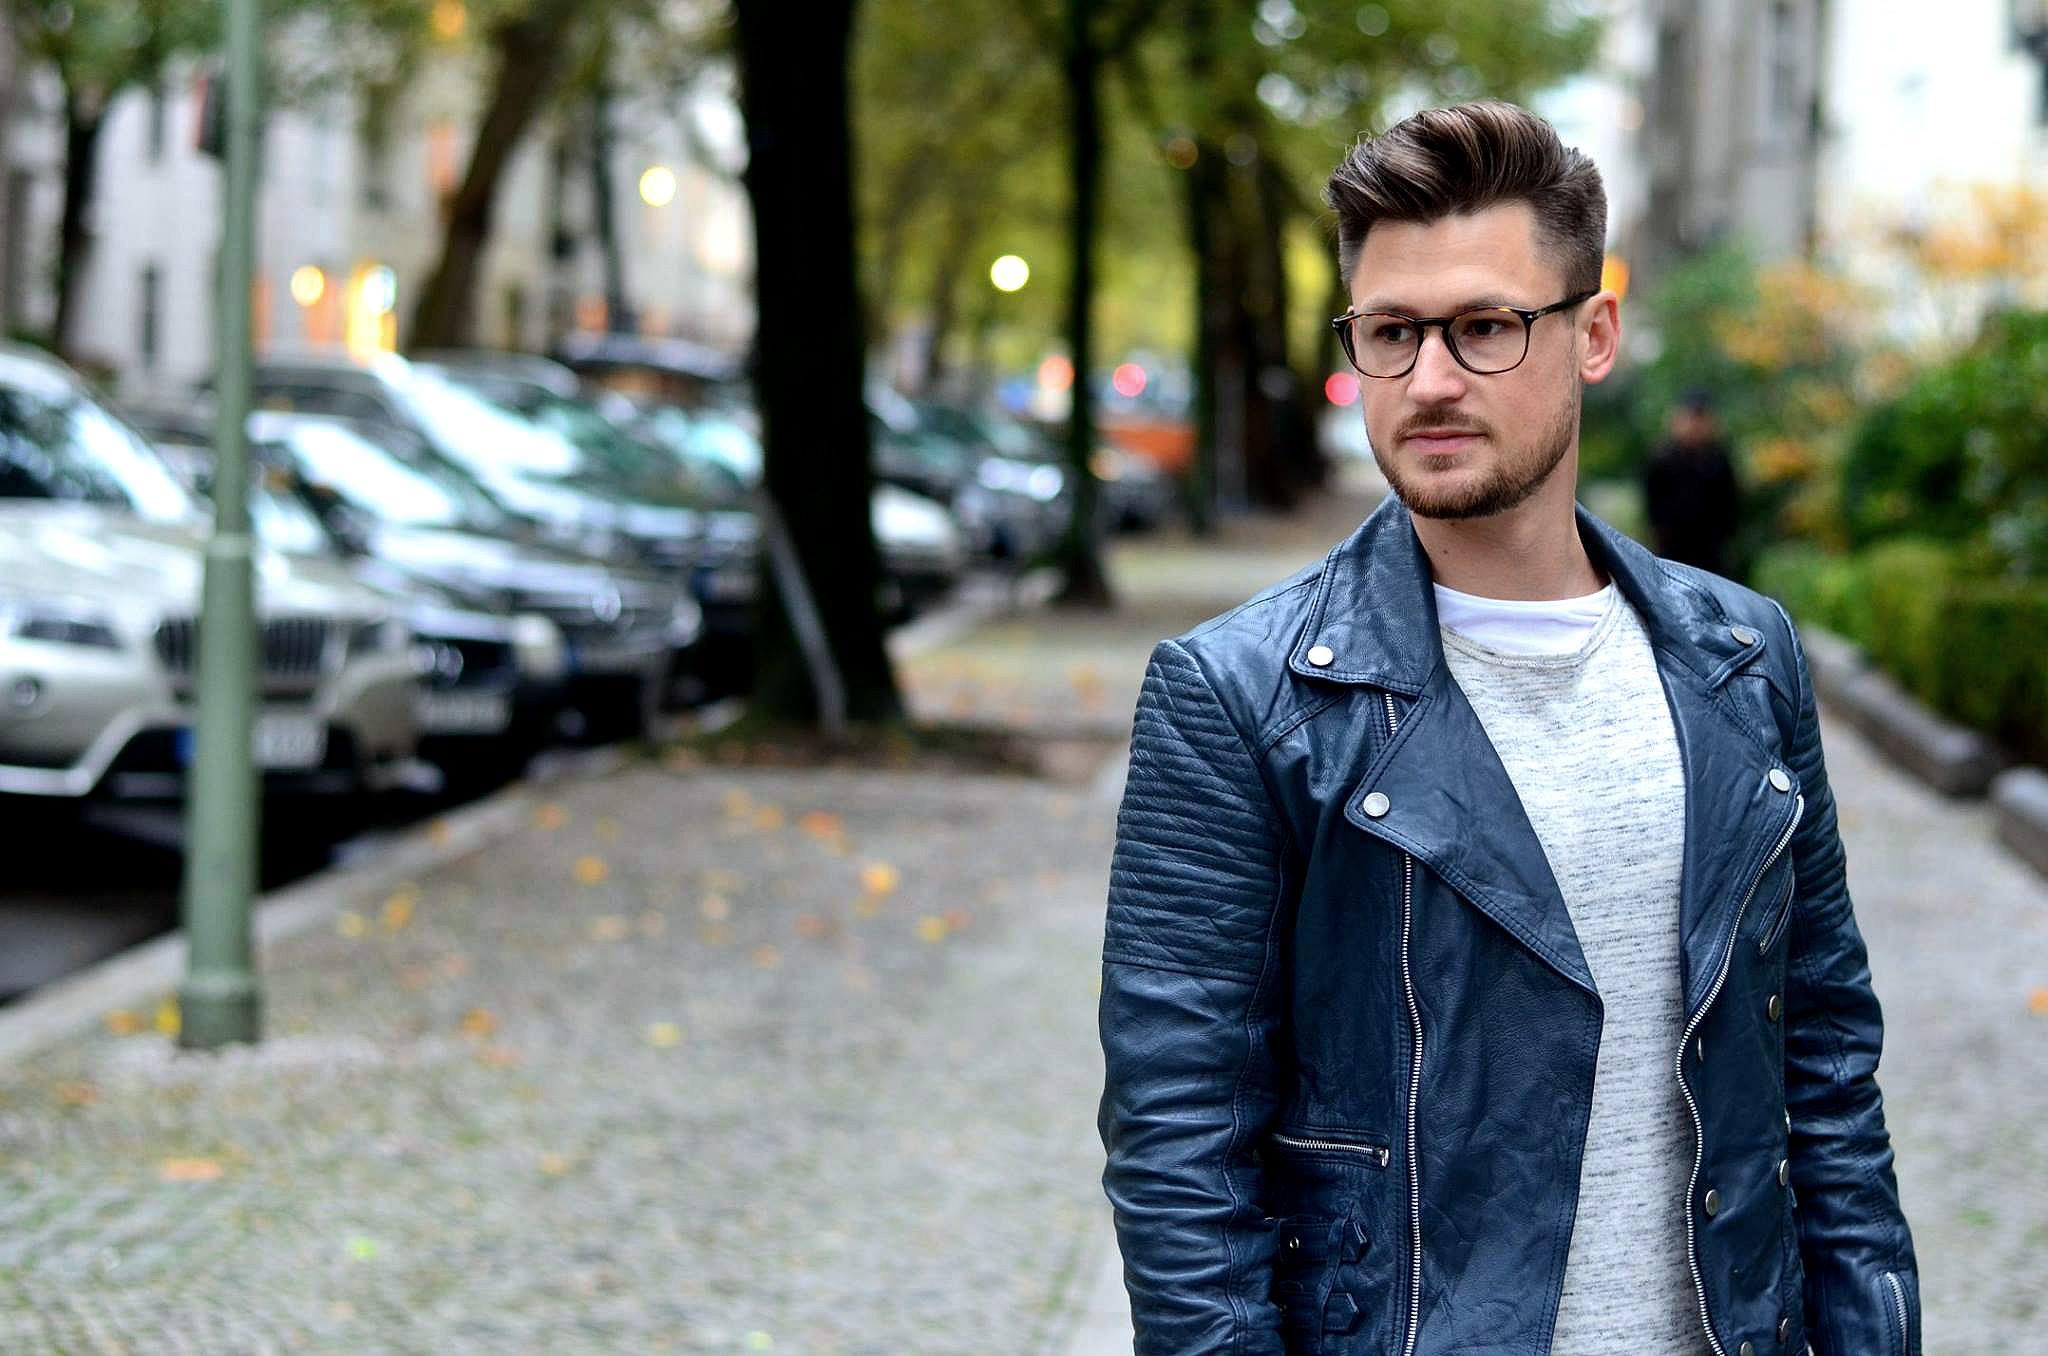 Styleblog-Männerblog-Berlin-Lederjacke-chelseaboots-streetwear-männermode